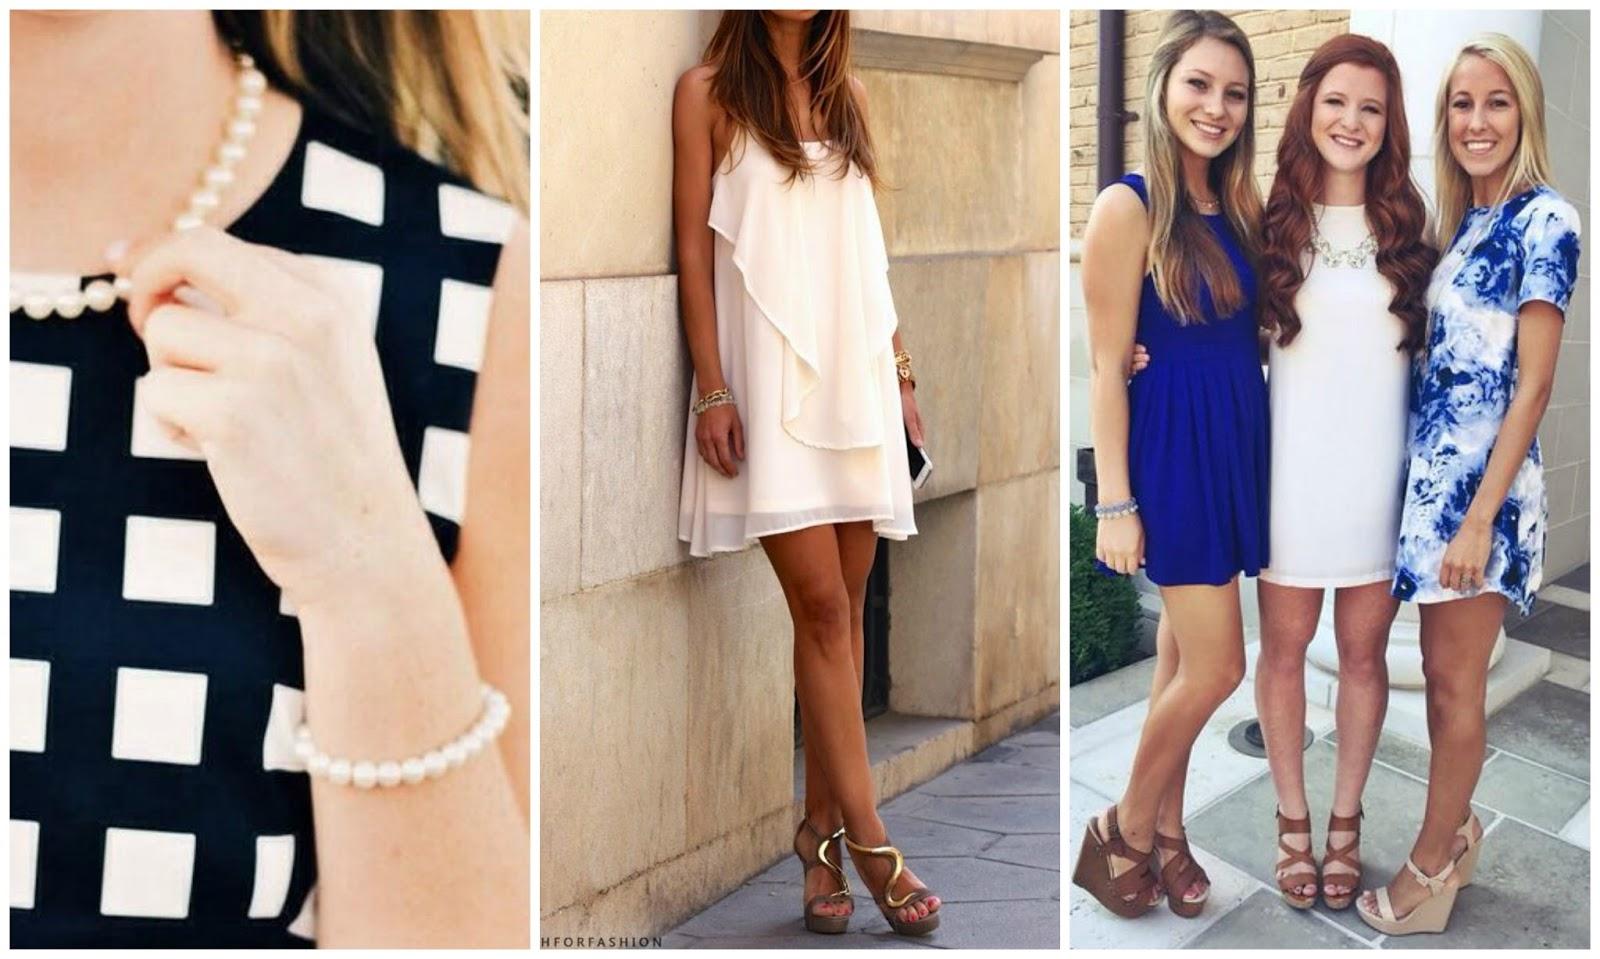 Fashion style University miami sorority recruitment what to wear for lady